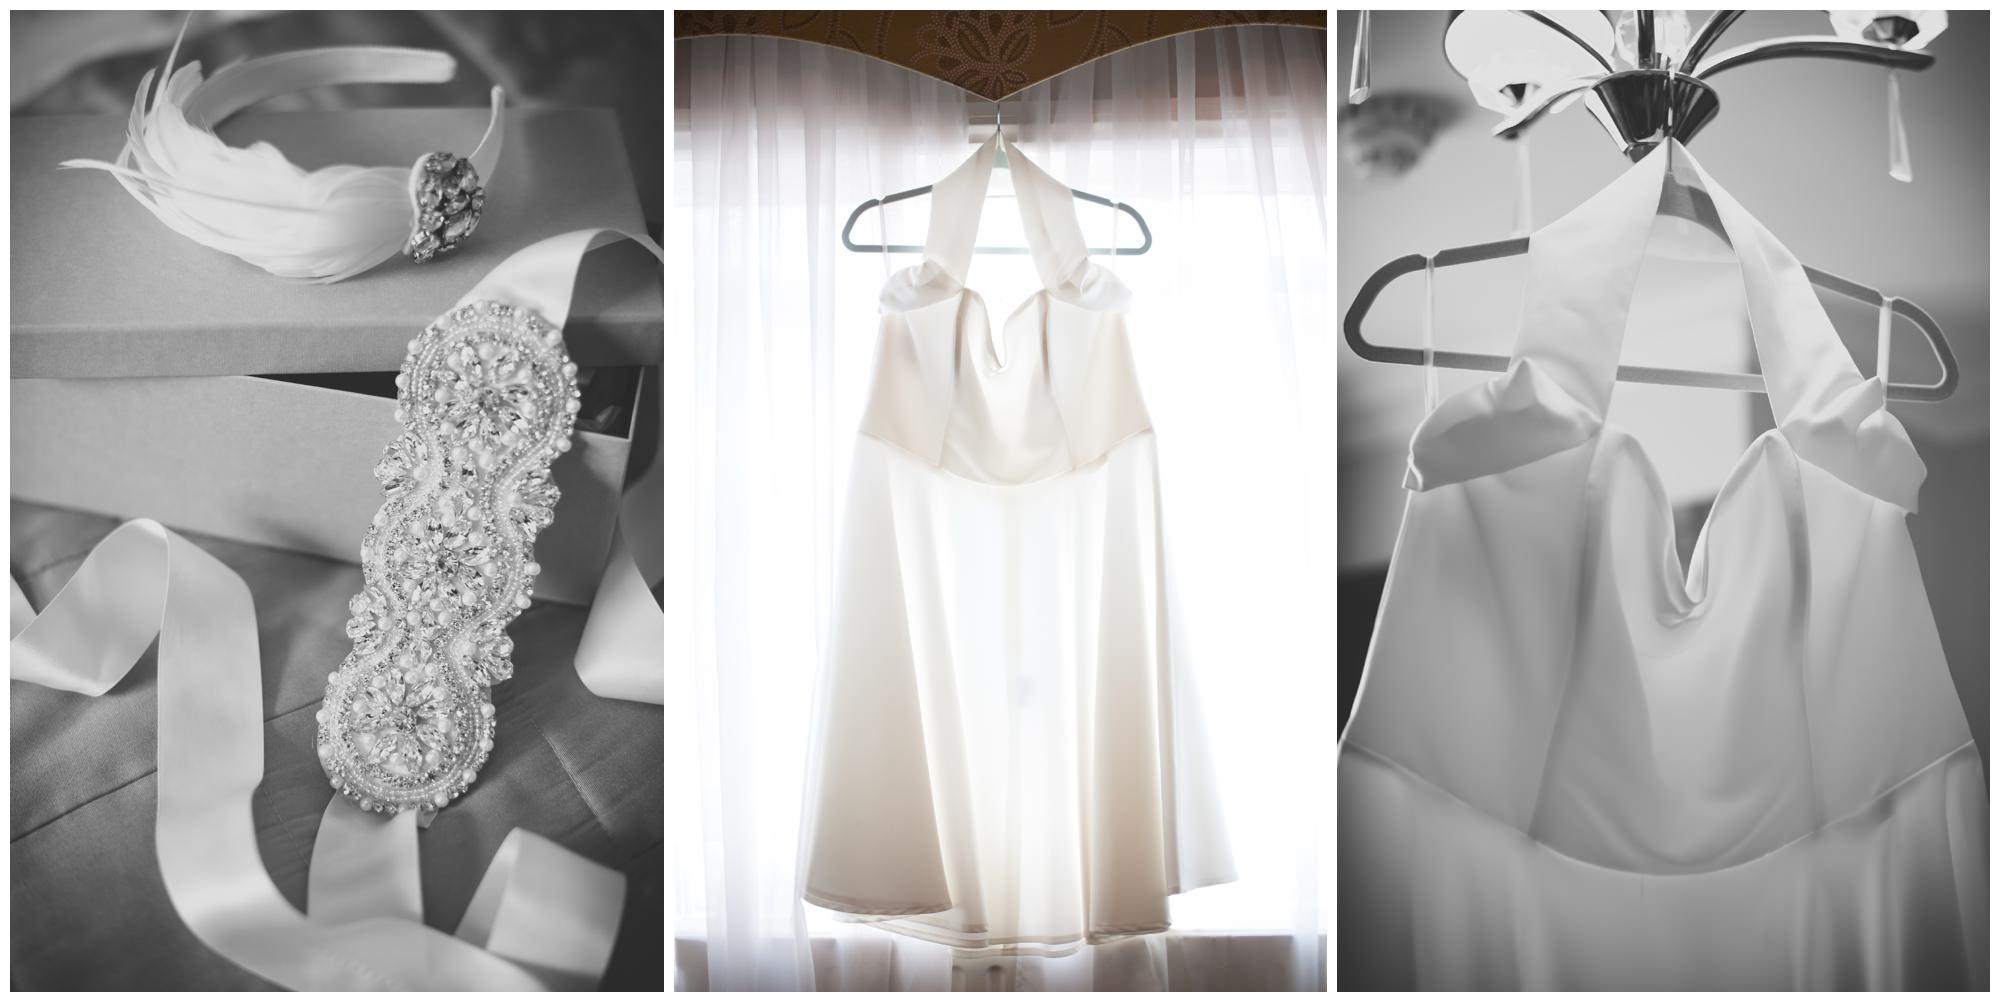 Vivien Of Holloway Wedding Dress at Christchurch